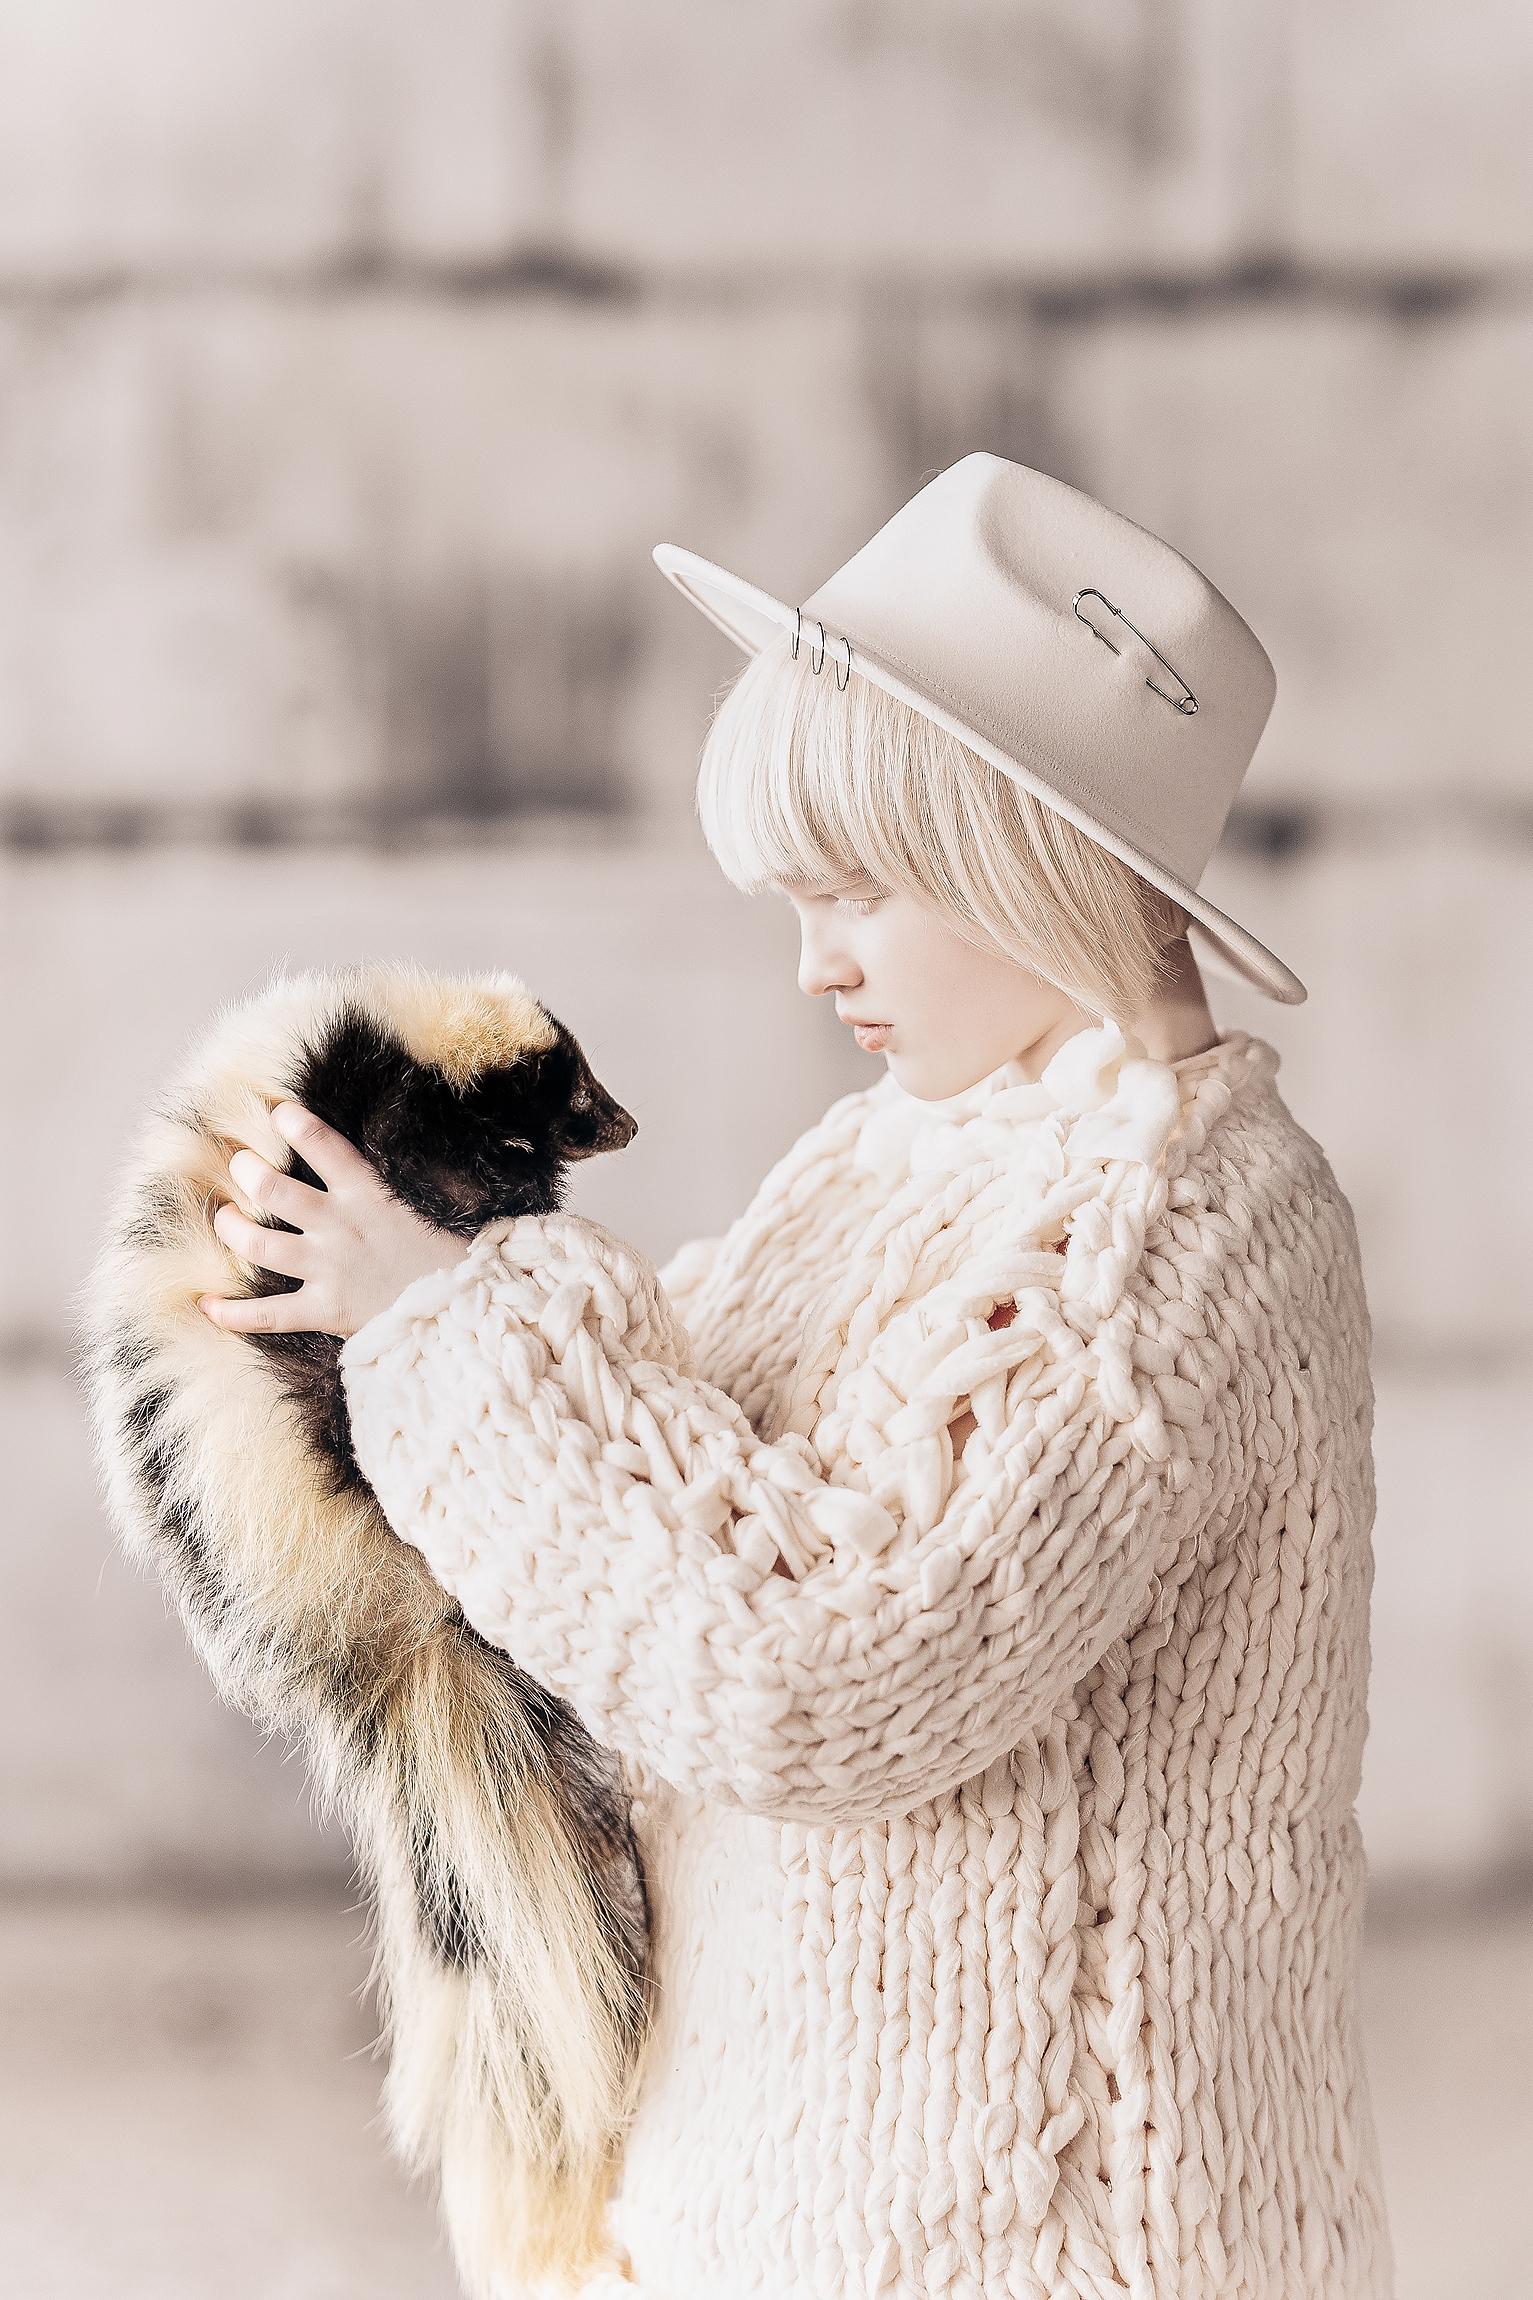 Хорек / Photographyzp Yana